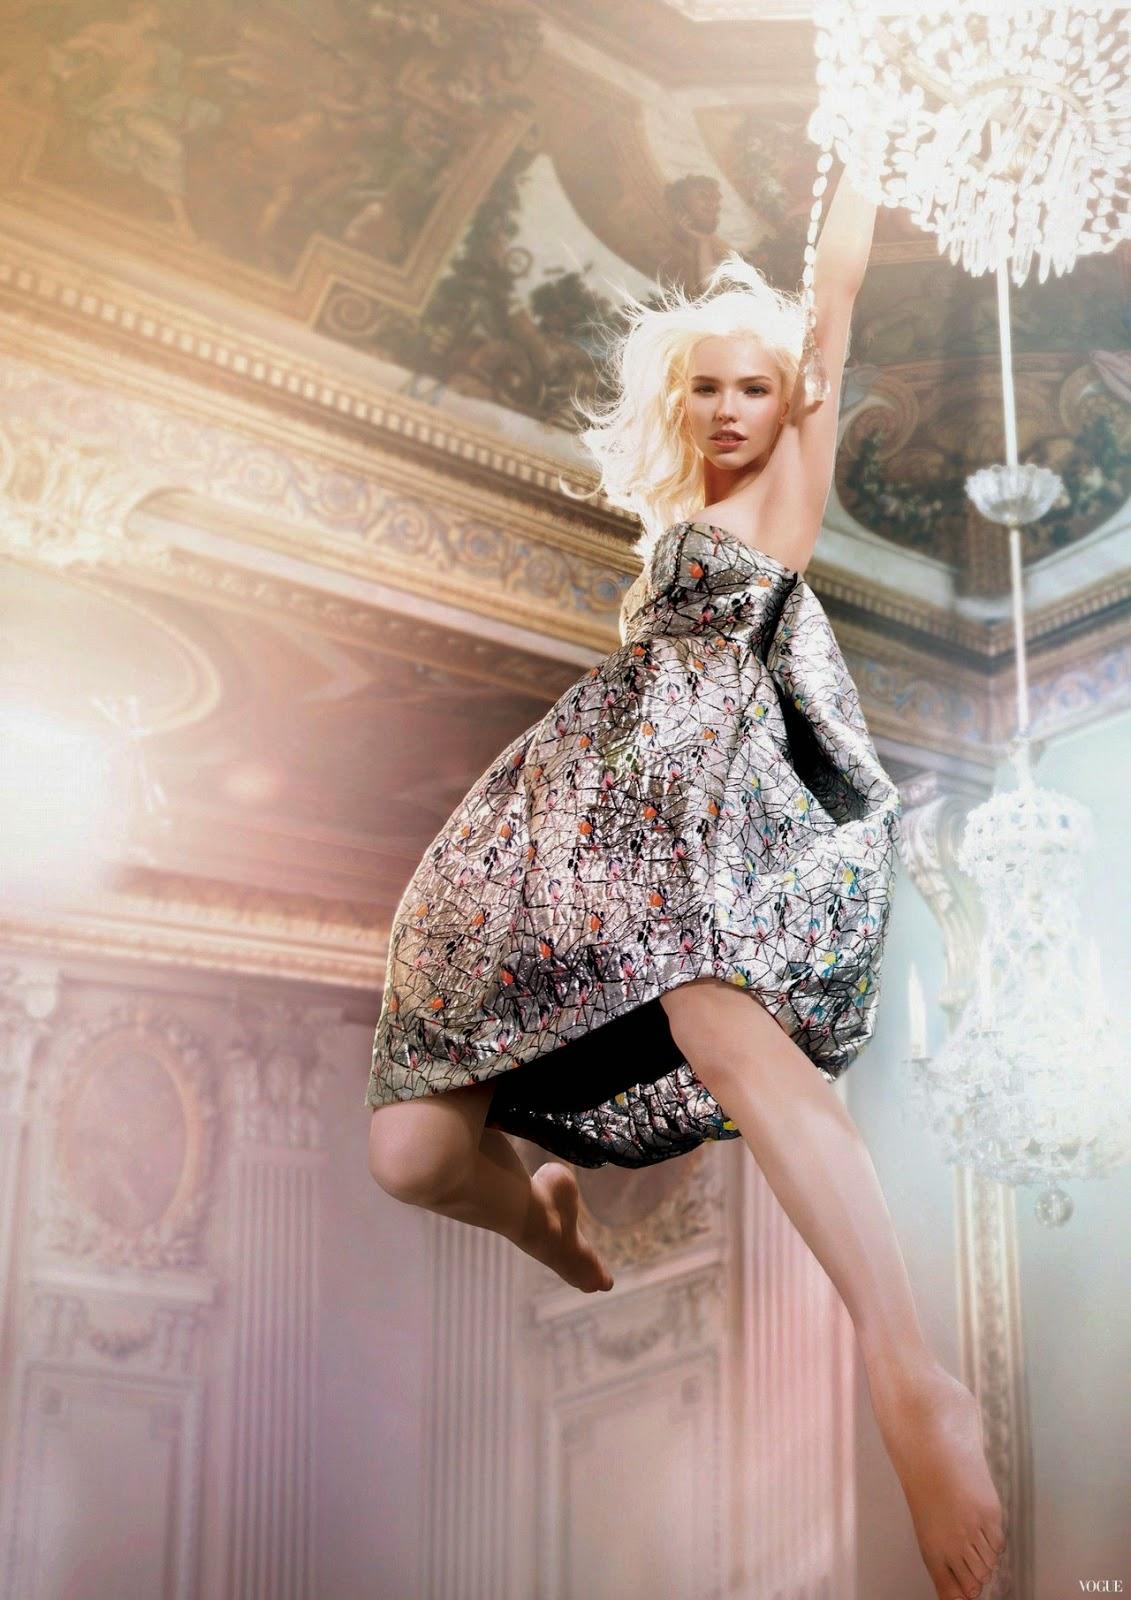 dior addict fragrance campaign 2014 featuring sasha luss